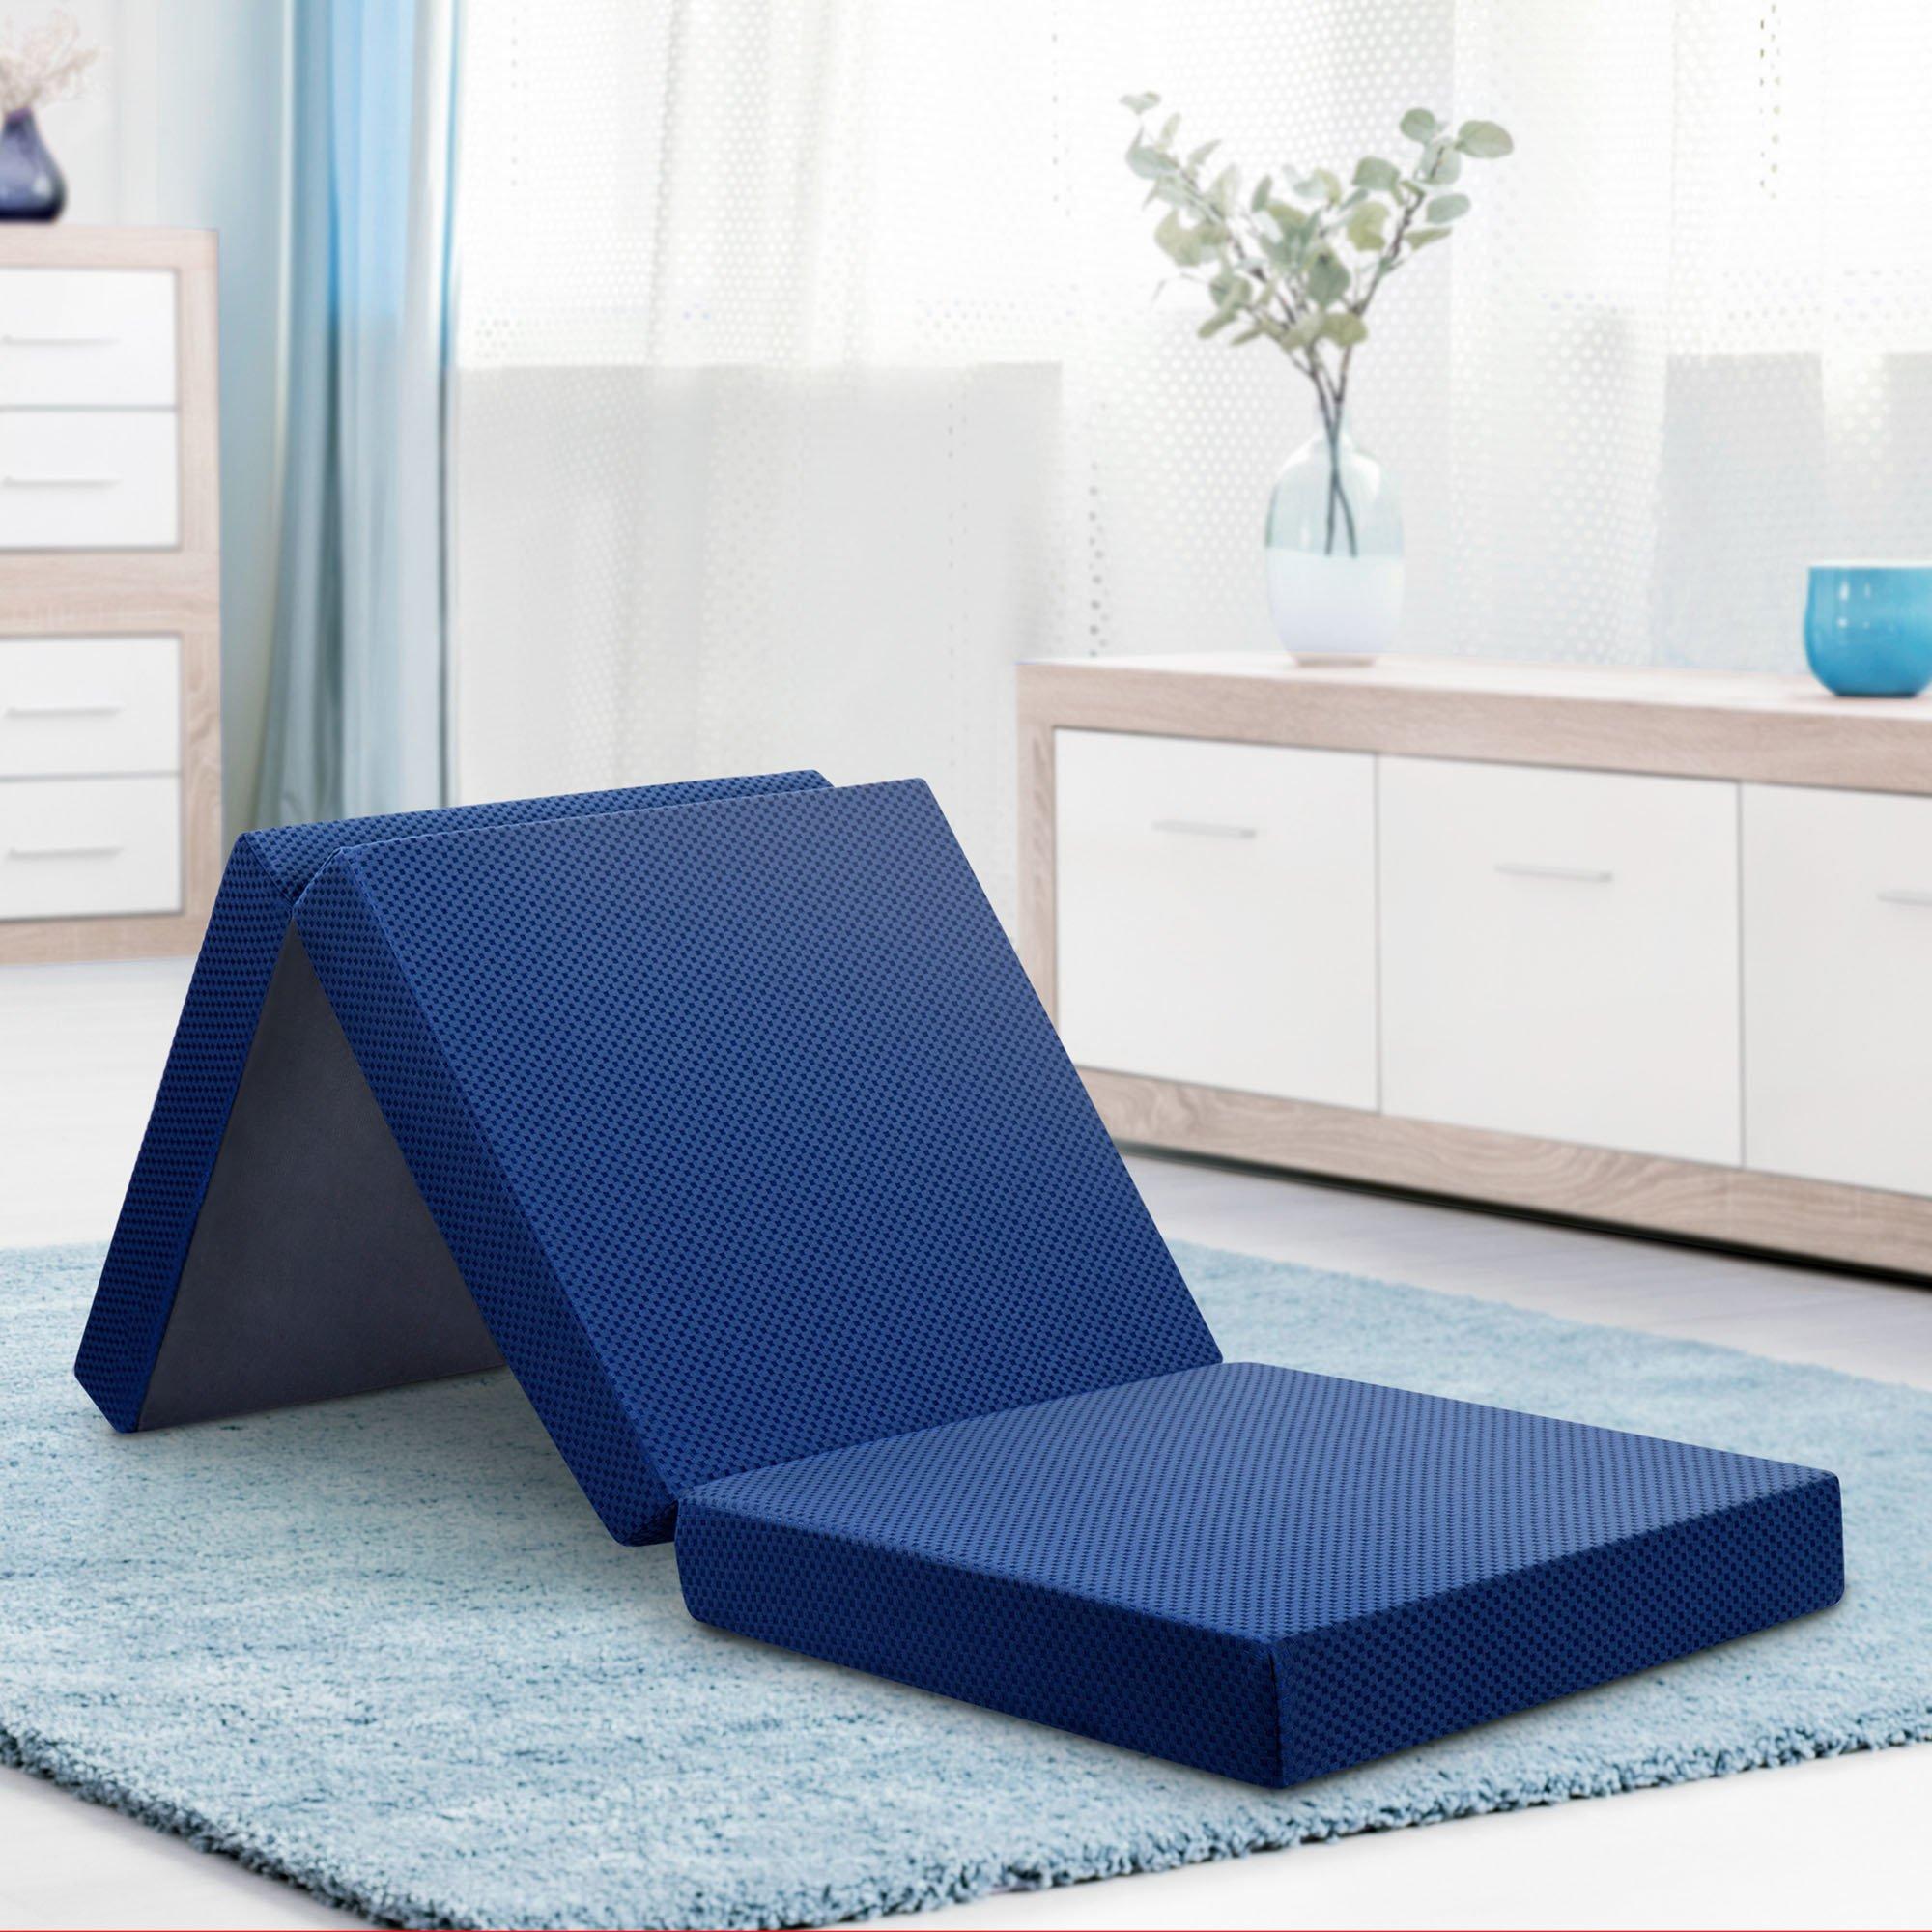 Olee Sleep OLR04TM02S Tri-Folding Memory Foam Topper, 4'' H, Blue